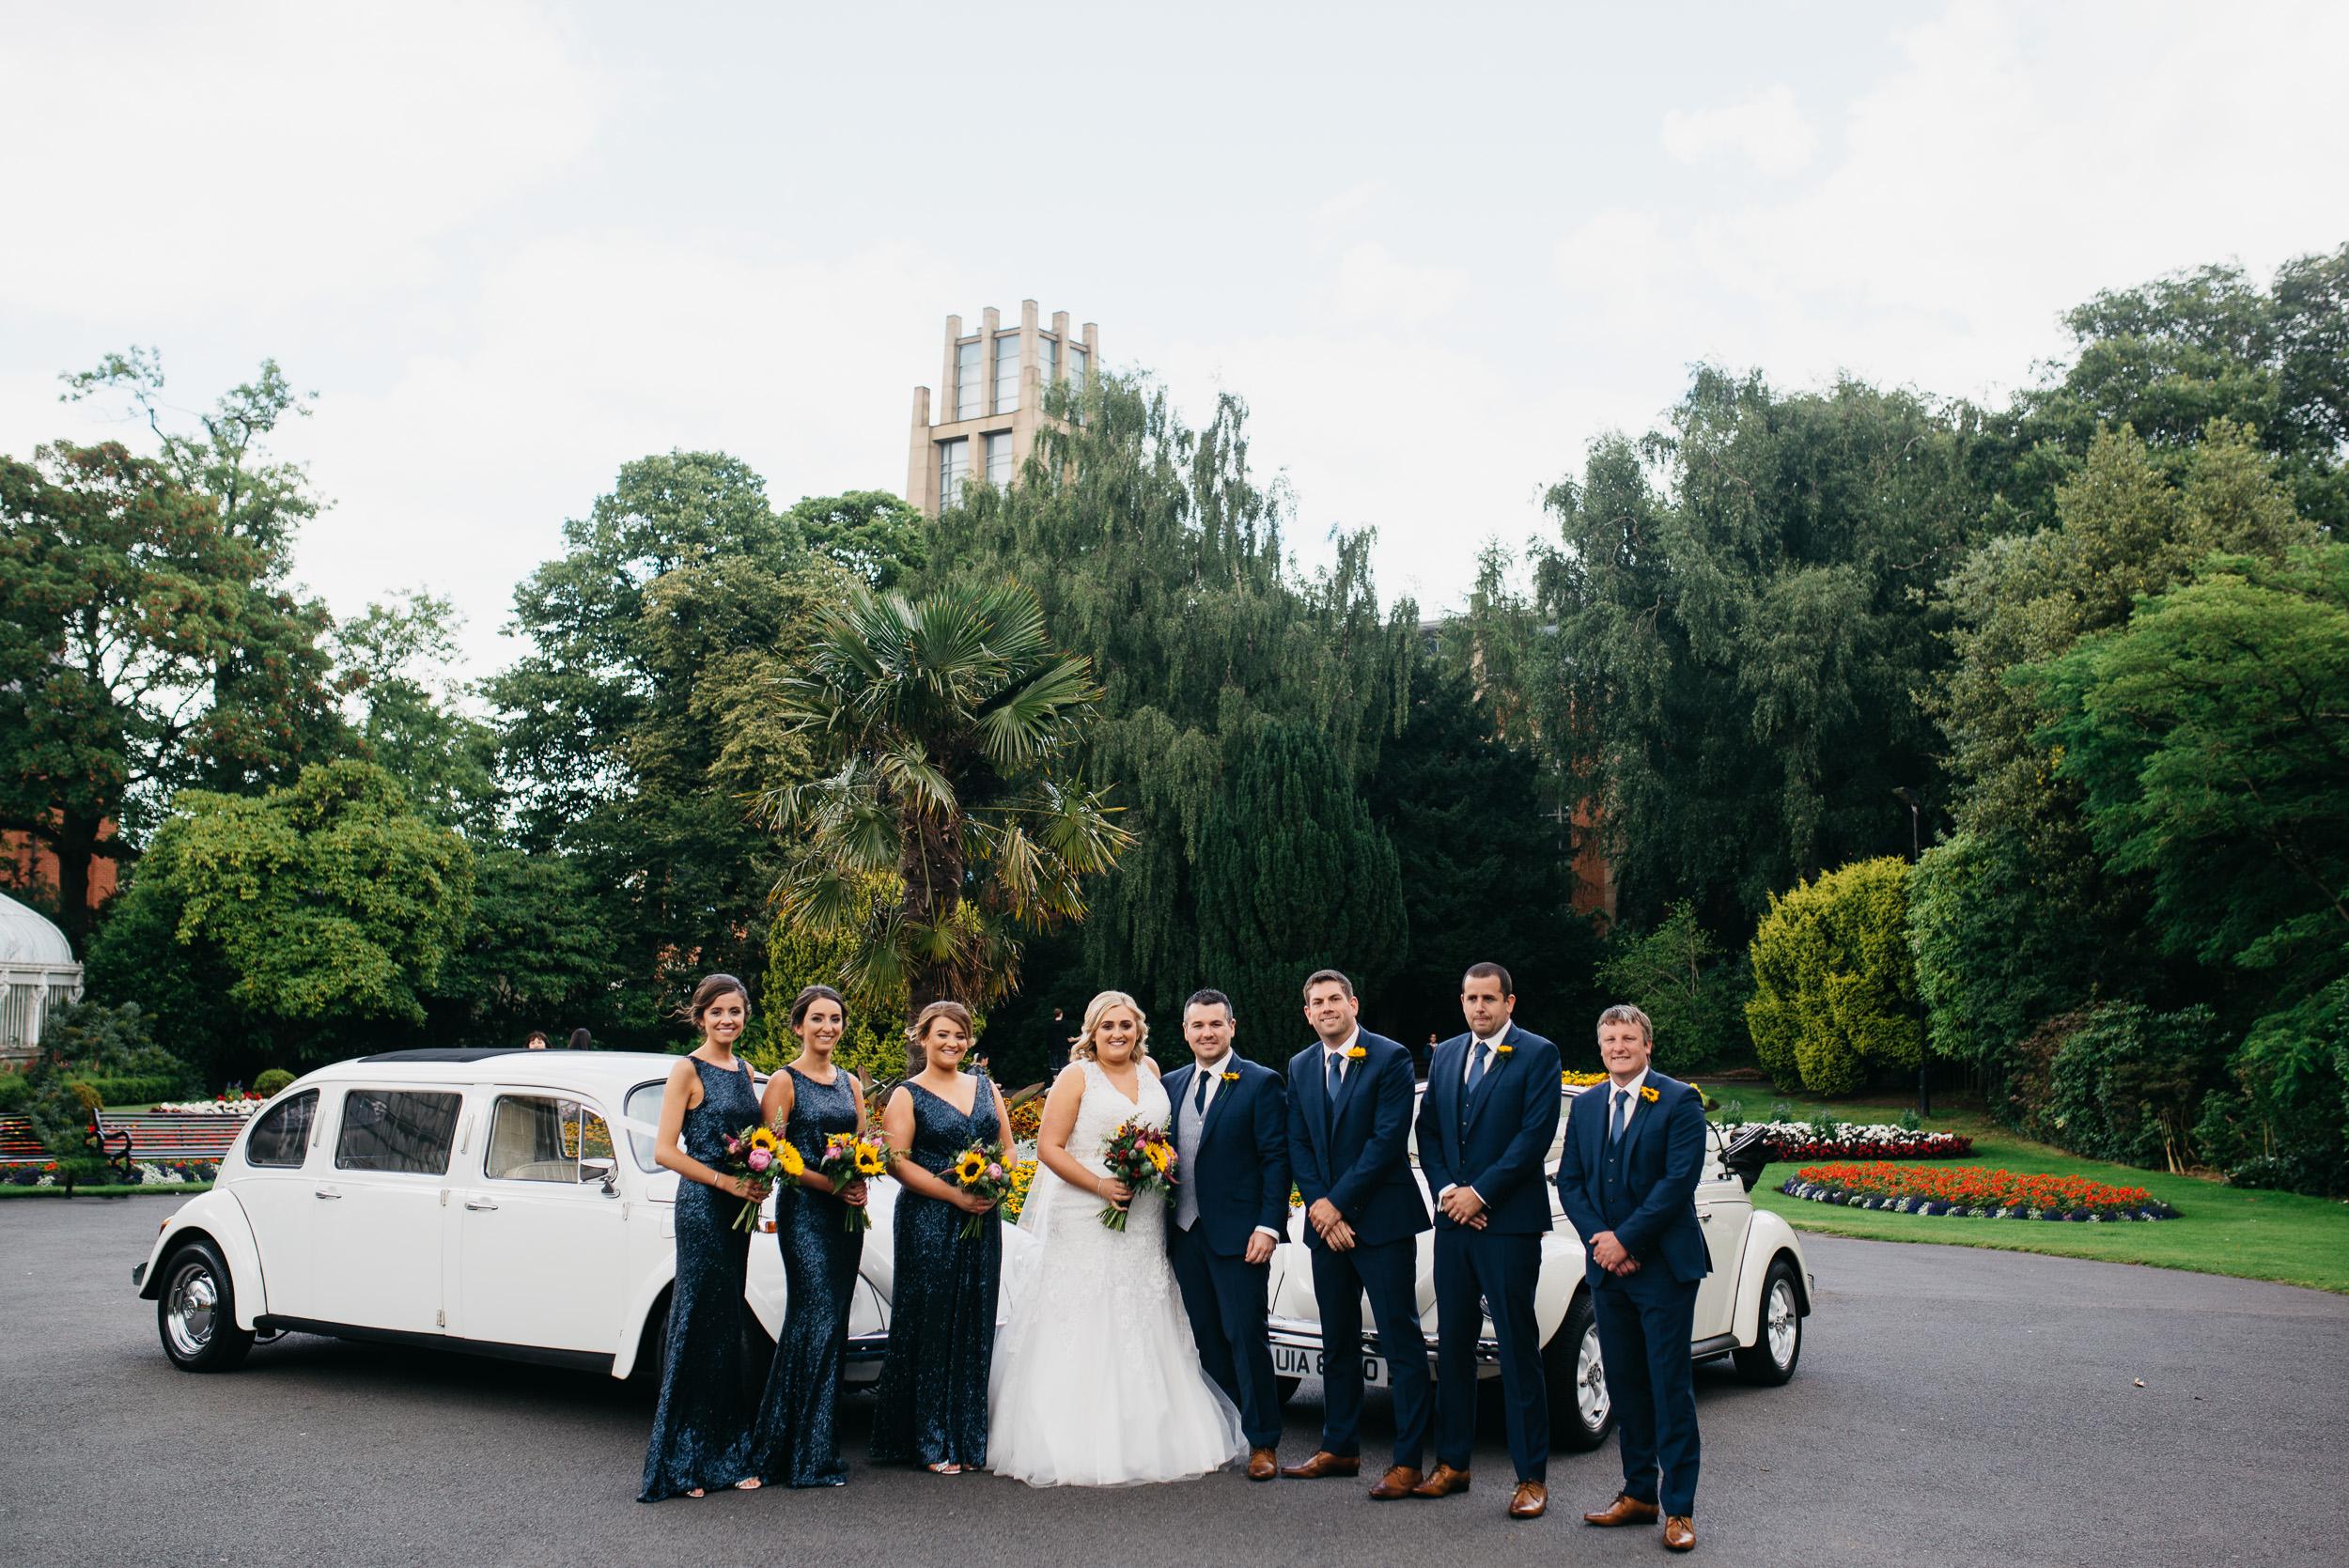 wedding photogaphy peter mackey 2018 nic-2.jpg